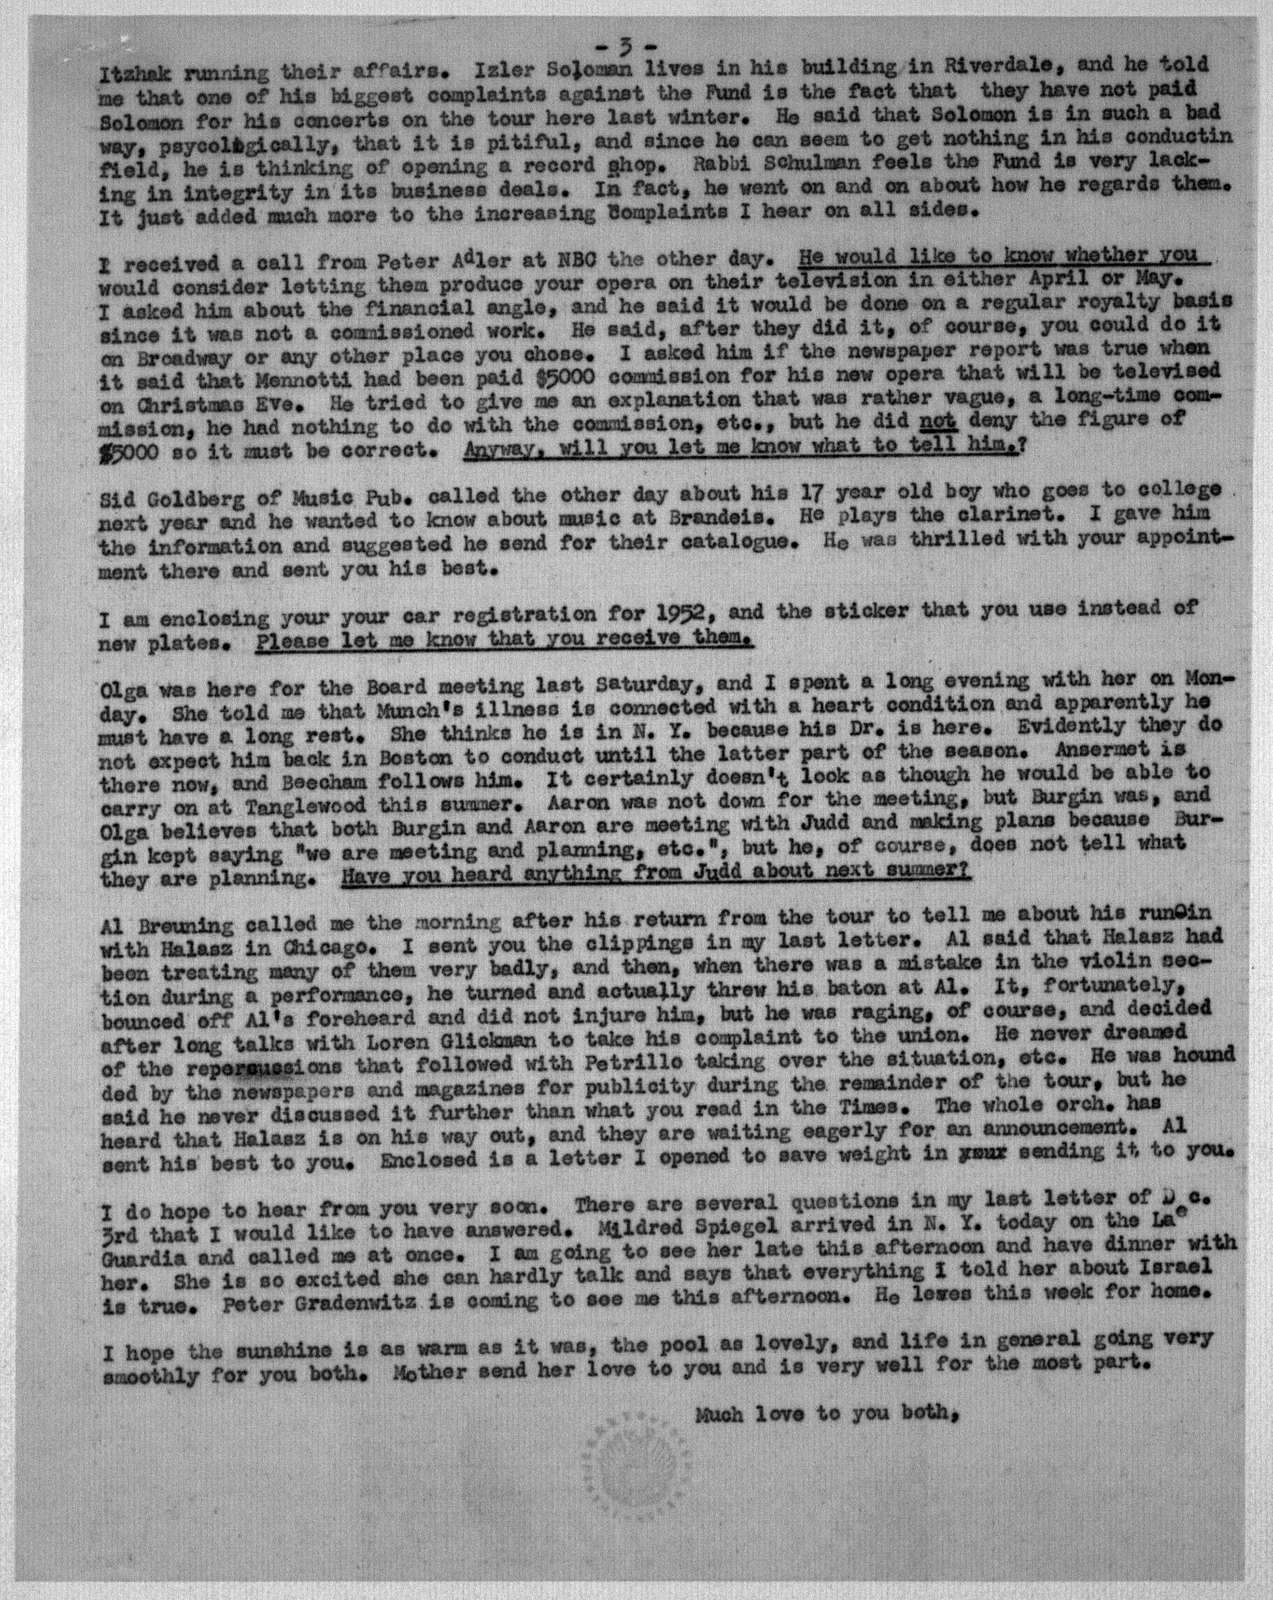 Letter from Helen Coates to Leonard & Felicia Bernstein, December 13, 1951